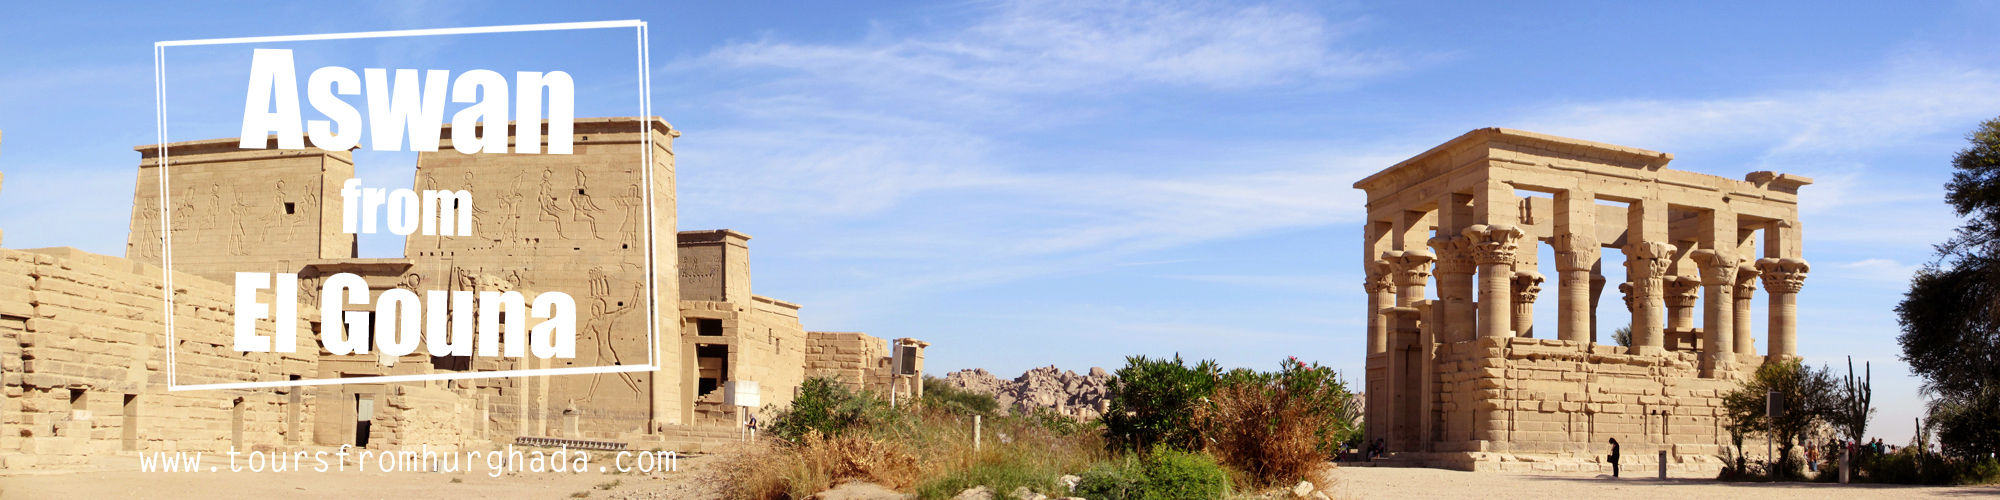 Trips to Aswan from El Gouna ToursFromHurghada